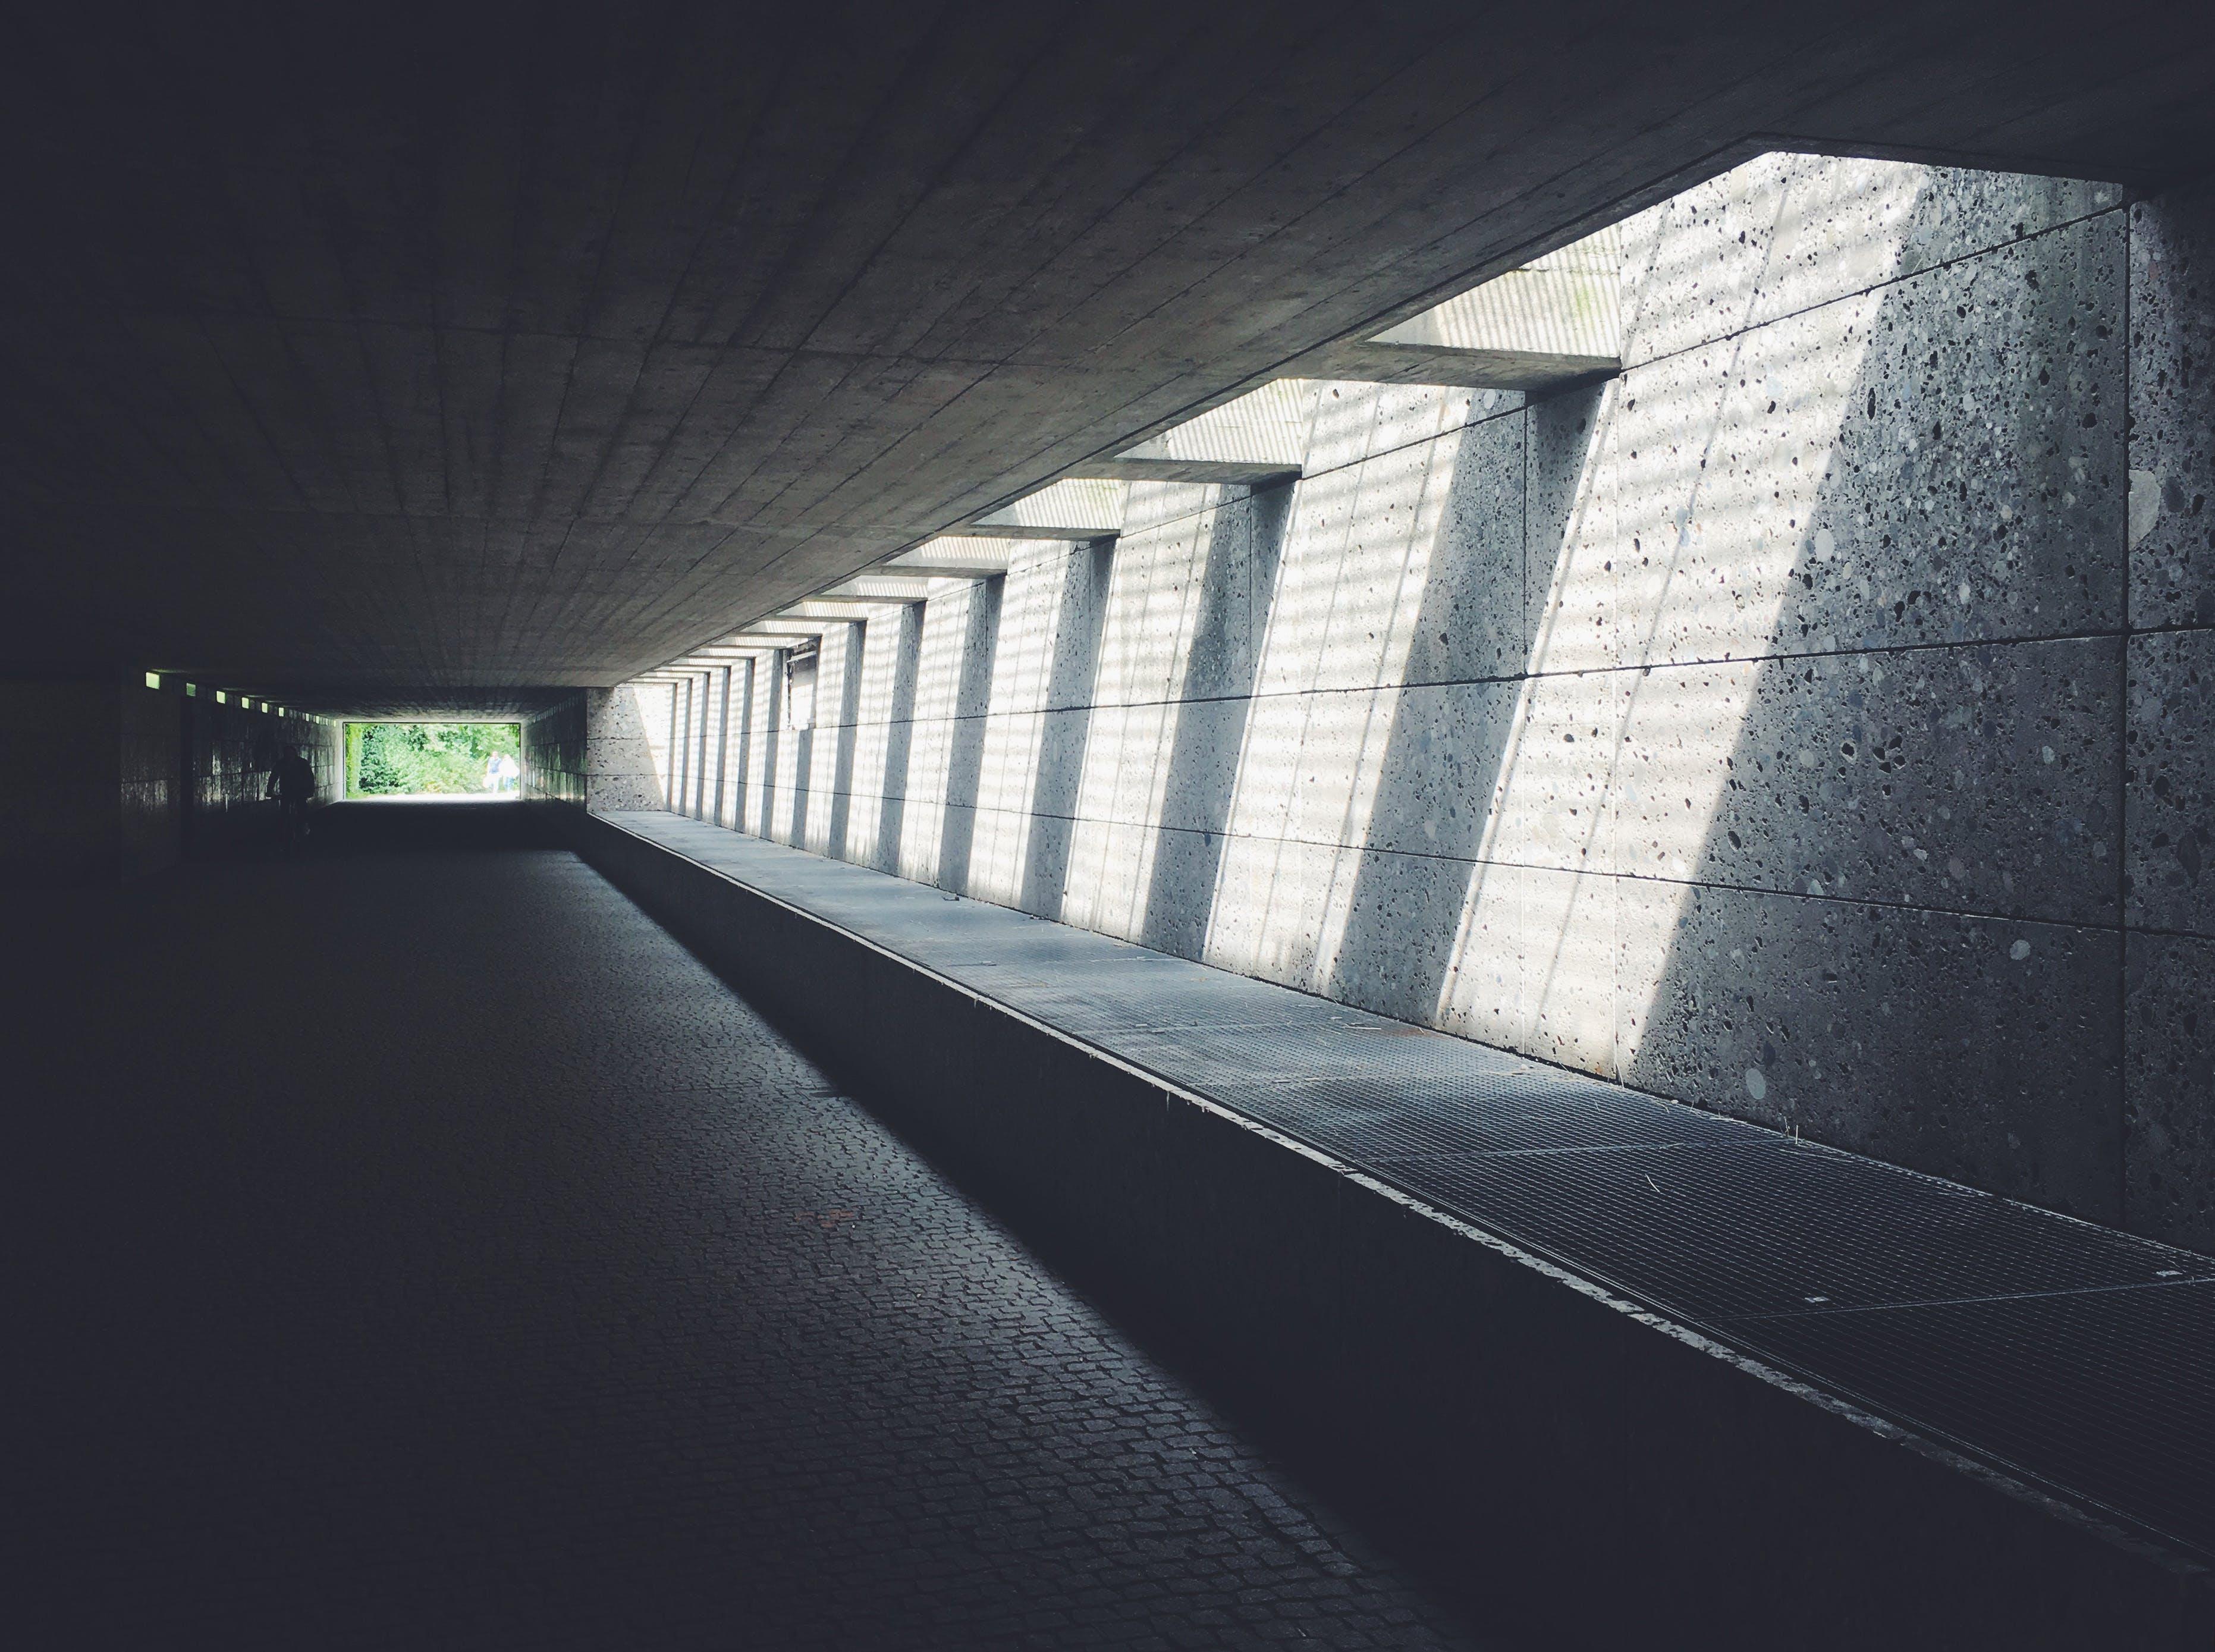 Sunlight Streaming Through Concrete Opening of Underground Passageway